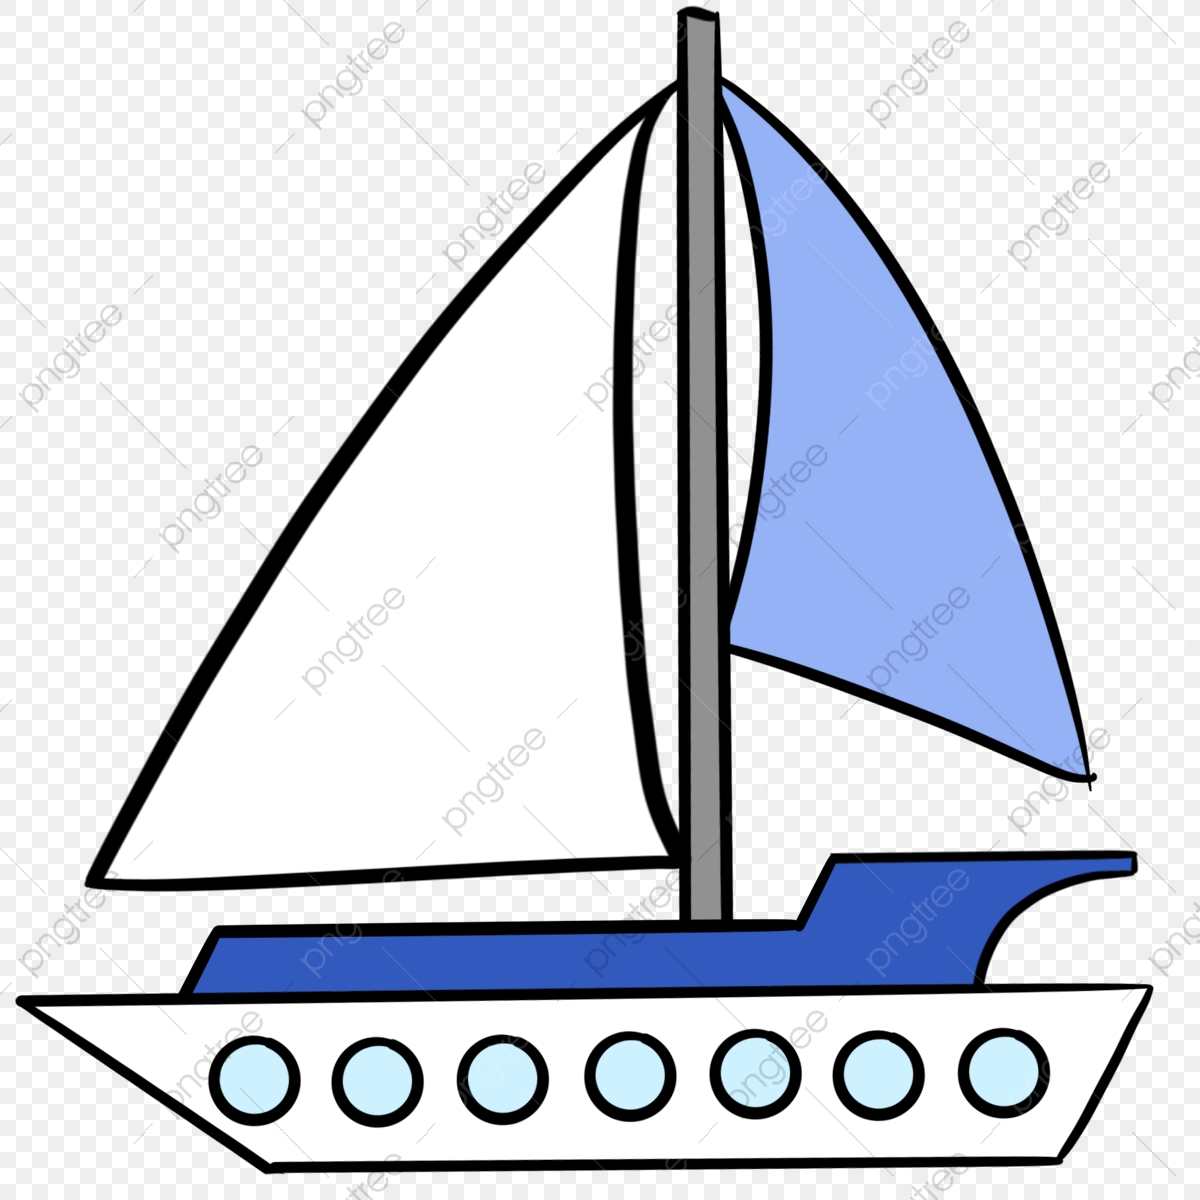 Blue Clip Art Boat Cruise Ship Lineart, Blue, Ferry, Clip Art PNG ...